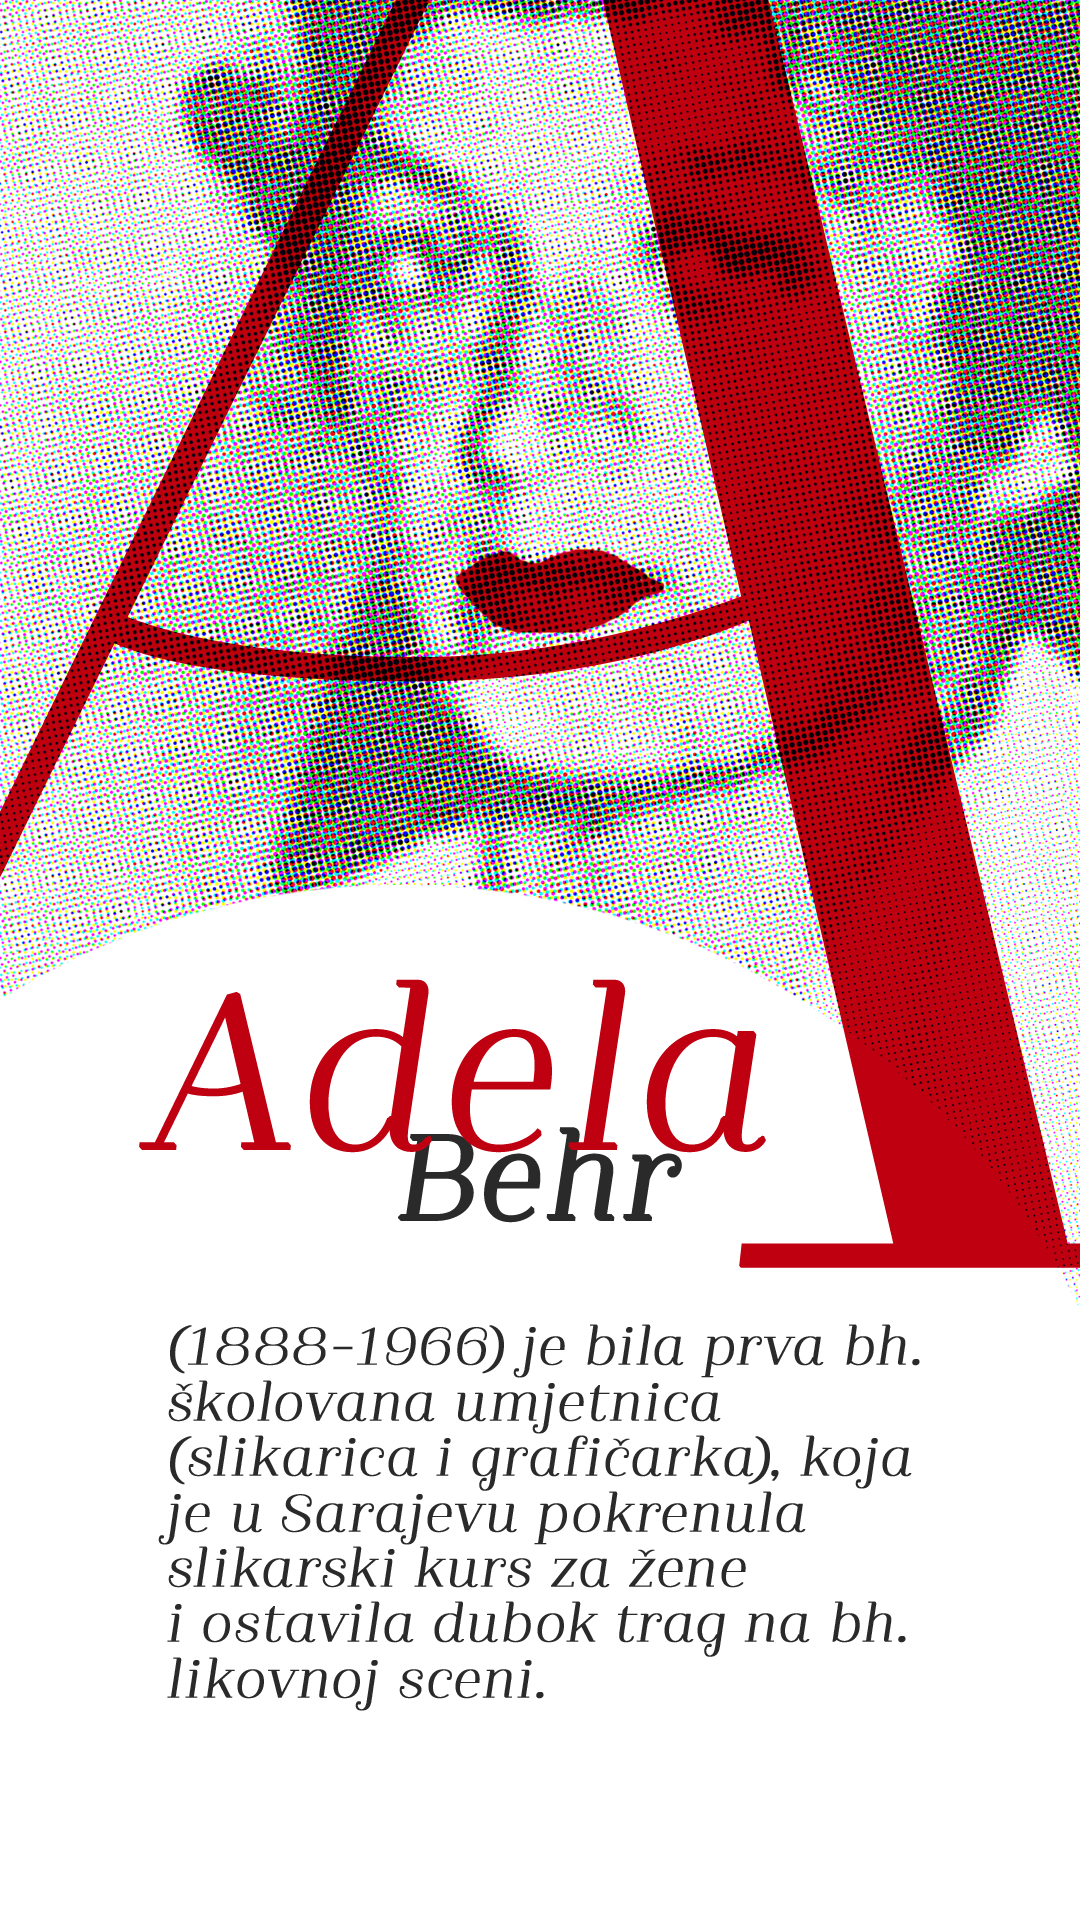 04 Adela Behr